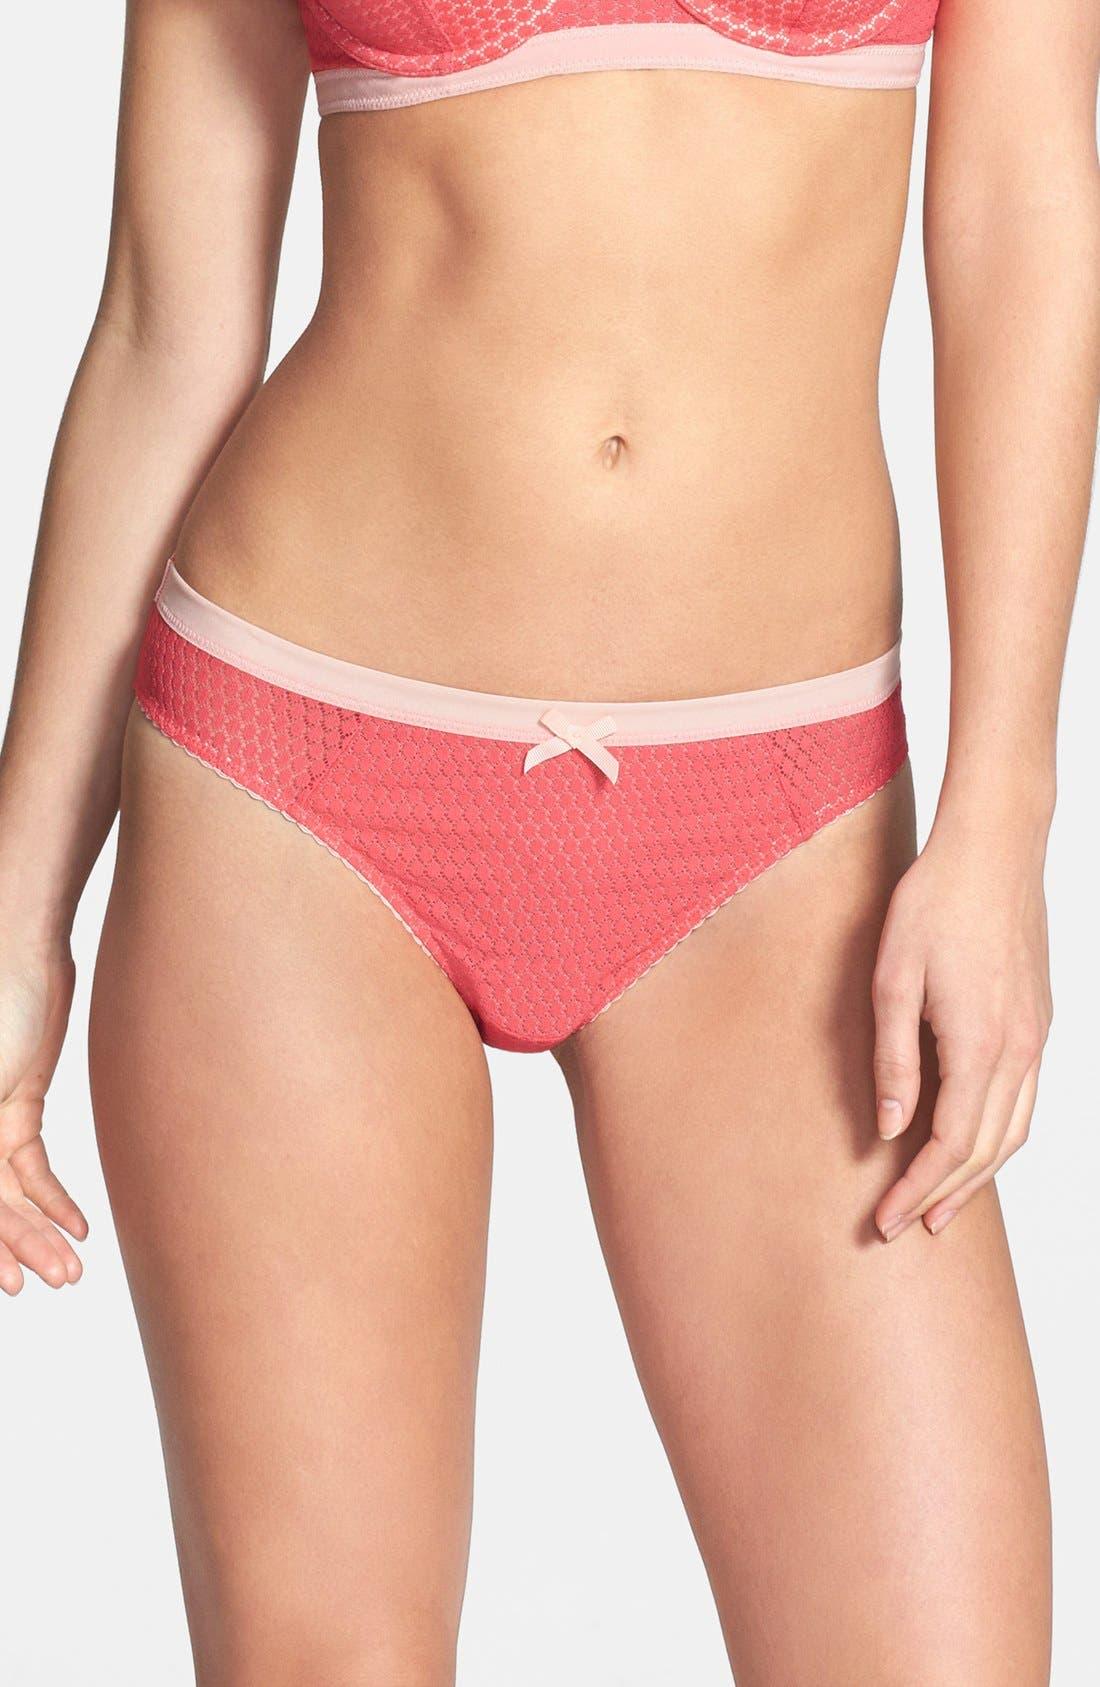 Alternate Image 1 Selected - Elle Macpherson Body 'Safari Style' Thong